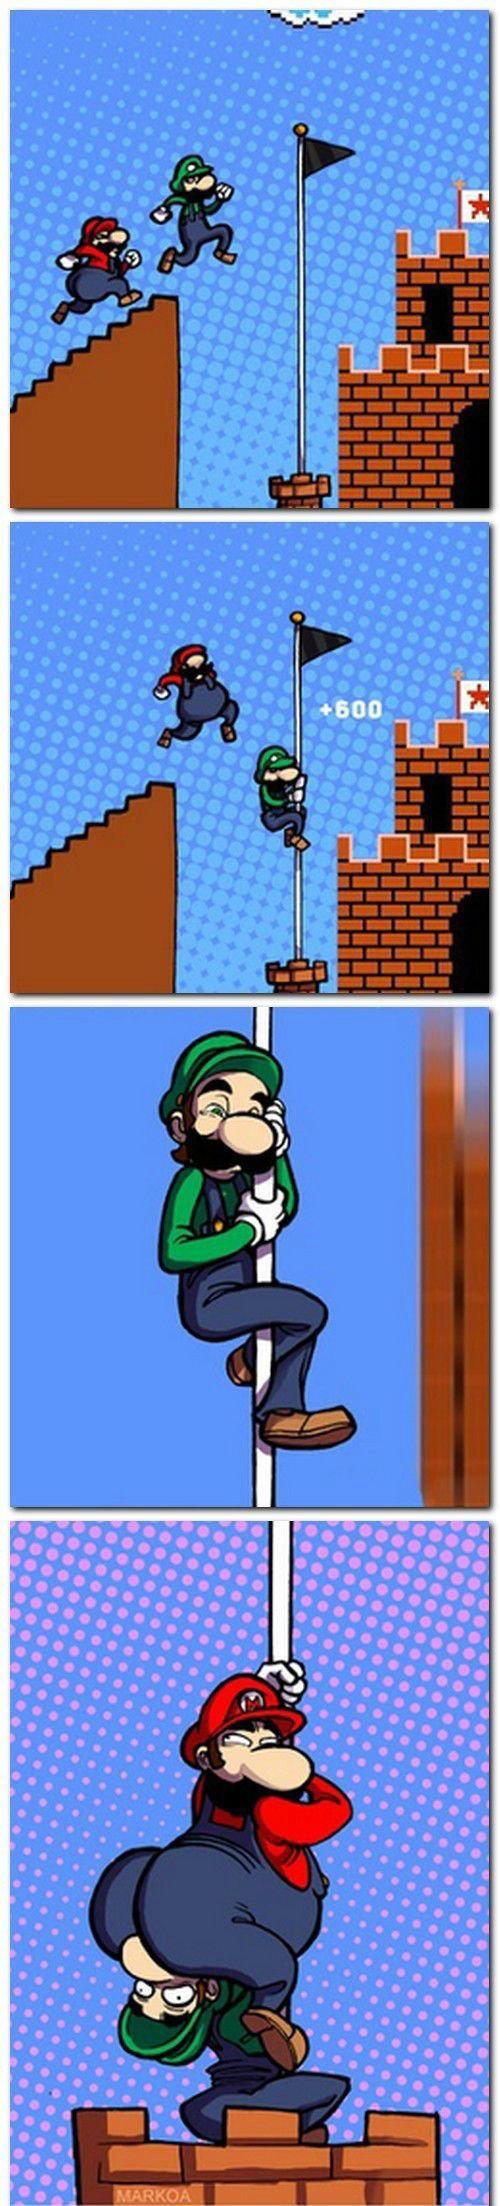 mario & luigi. Super Mario Bros. (スーパーマリオブラザーズ Sūpā Mario Burazāzu?) is a 1985 platform video game internally developed by Nintendo EAD and published by Nintend